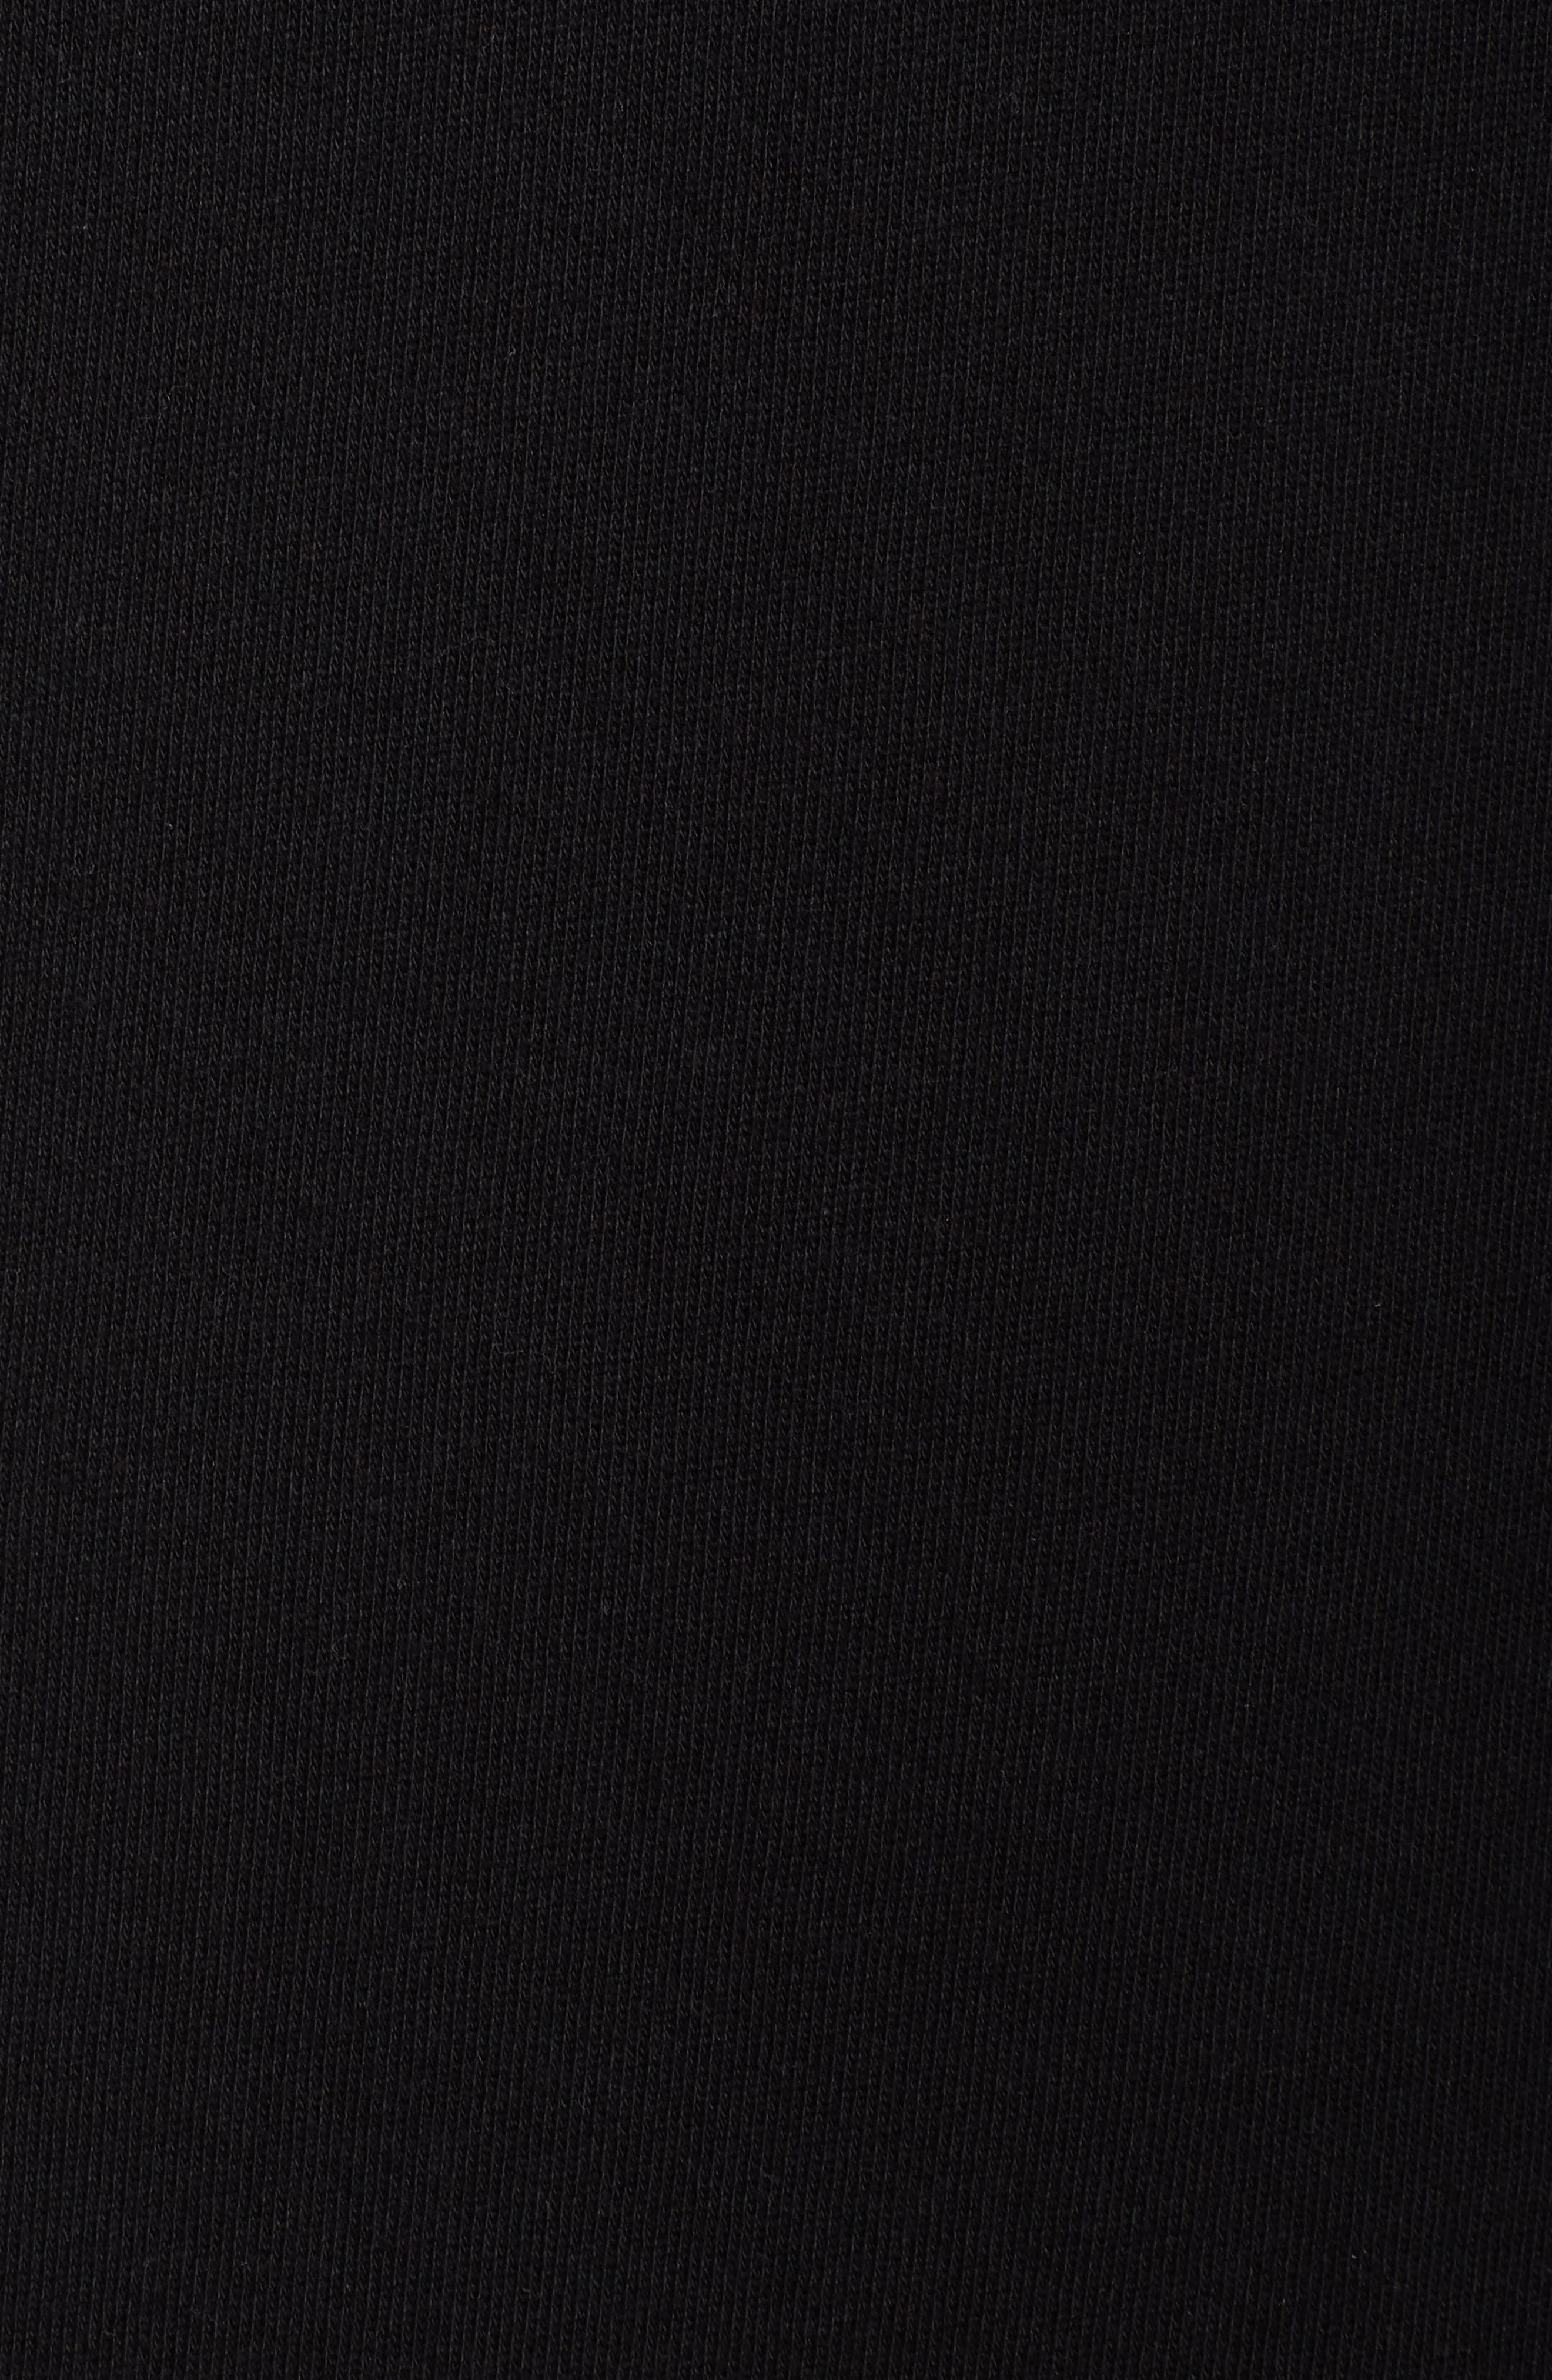 Off-Duty Hooded Sweatshirt Dress,                             Alternate thumbnail 5, color,                             001